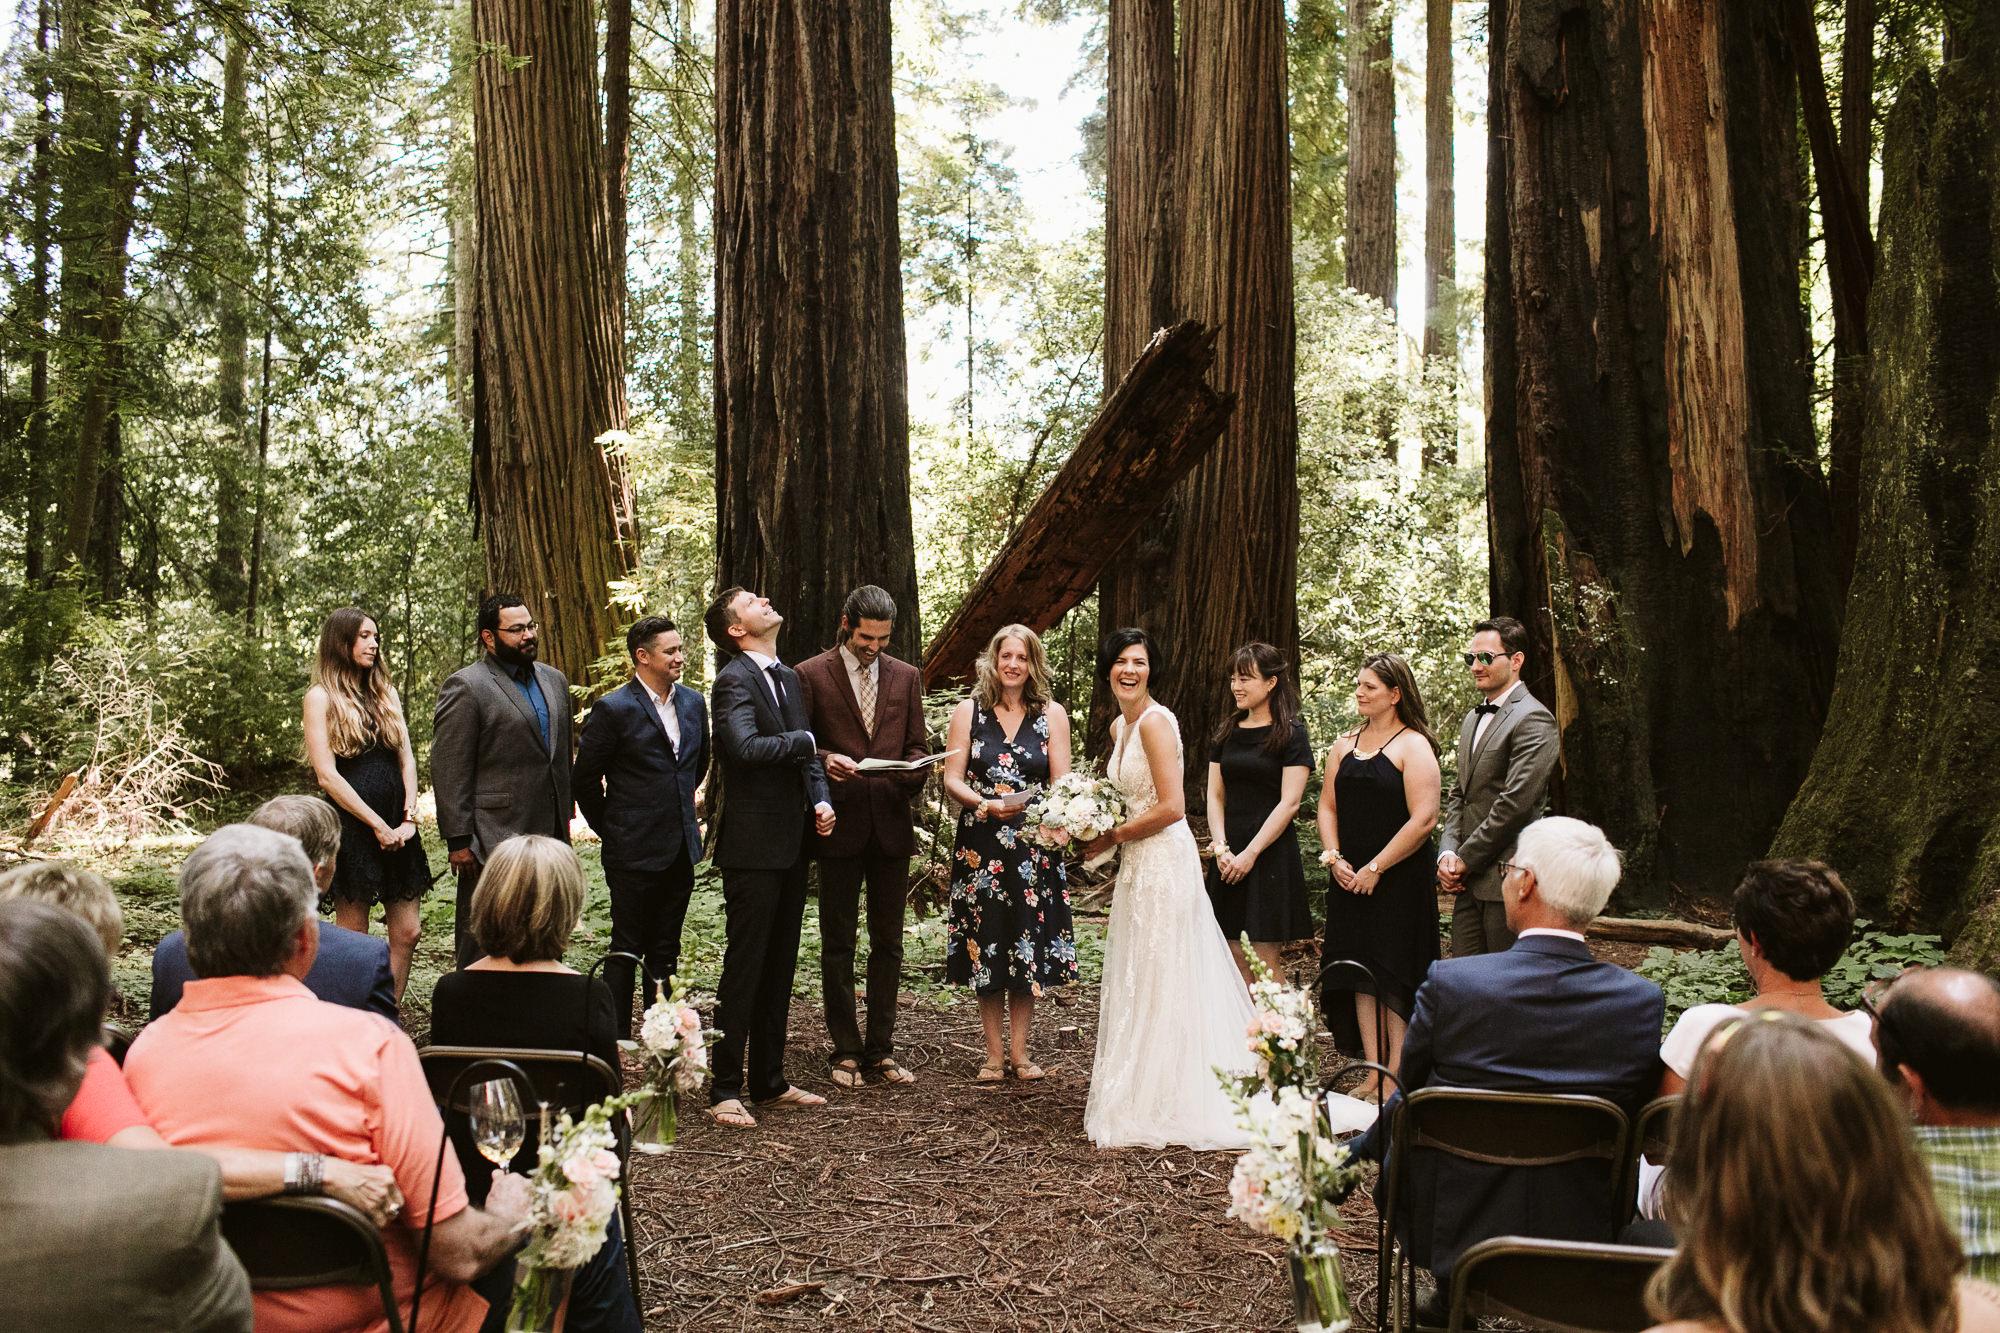 California-wedding-photographer-alfonso-flores-pamplin-groove-186.jpg